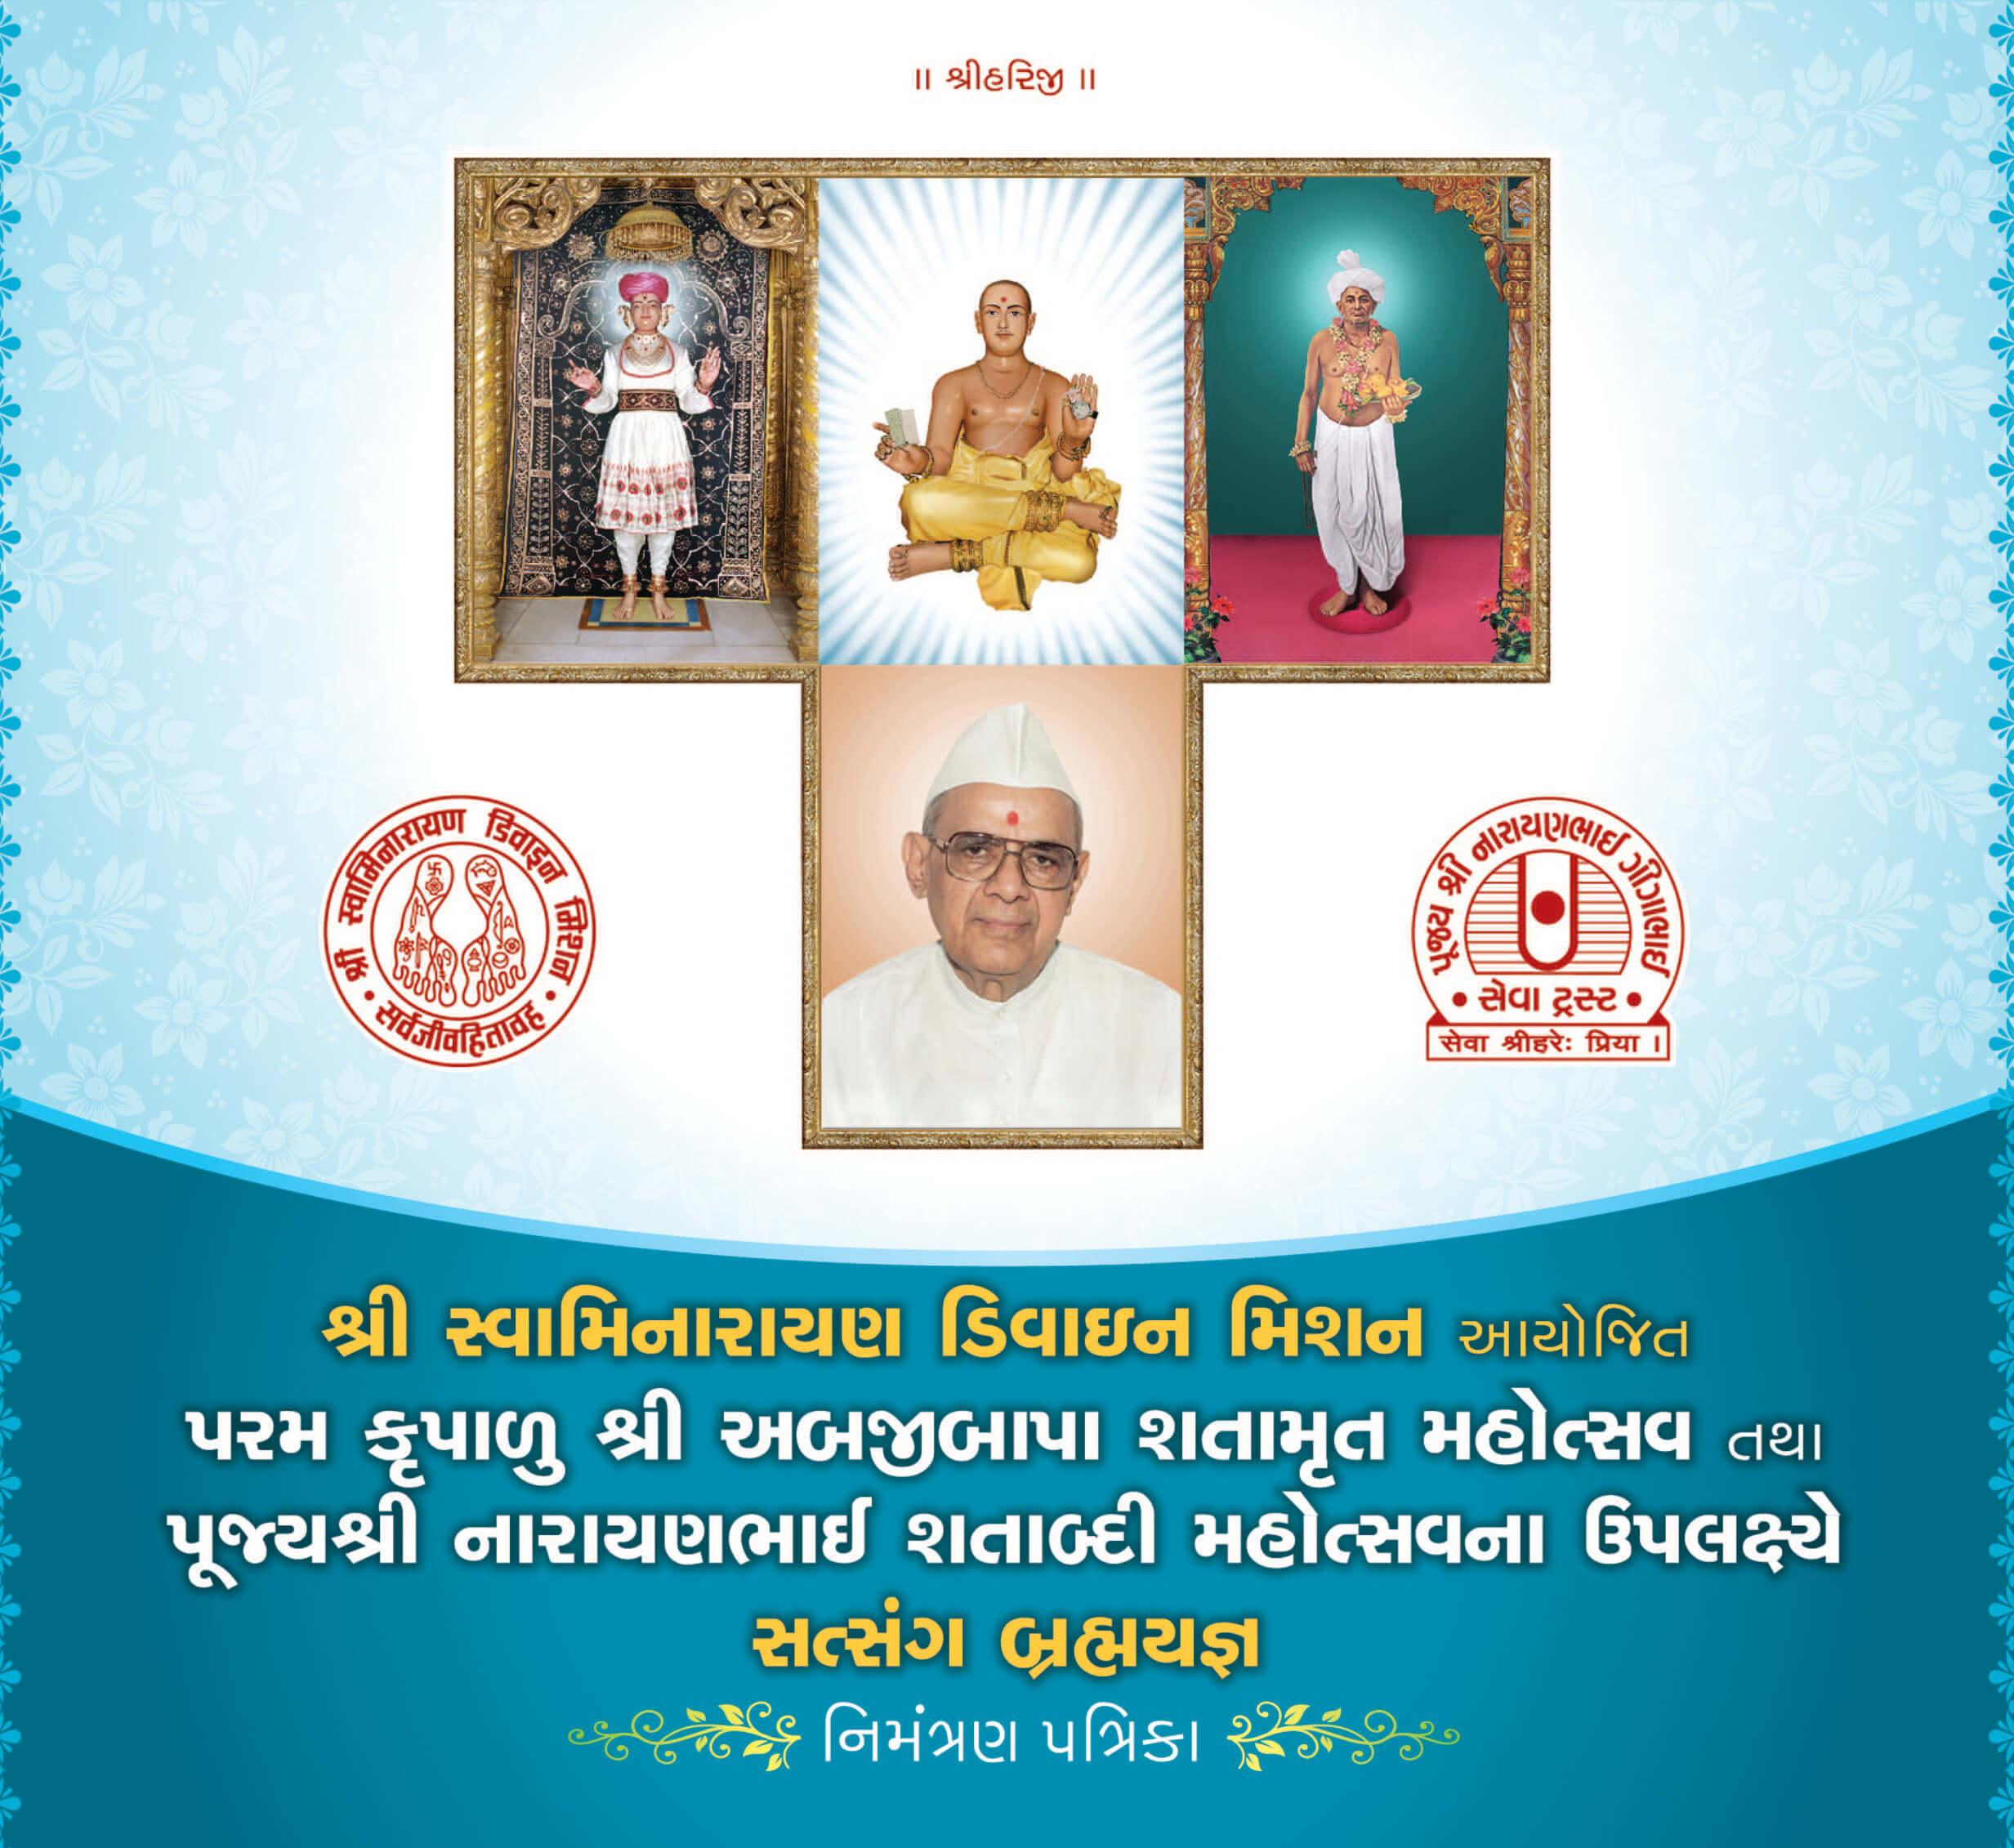 Satsang Brahmyagna Dt. 27/07/2019